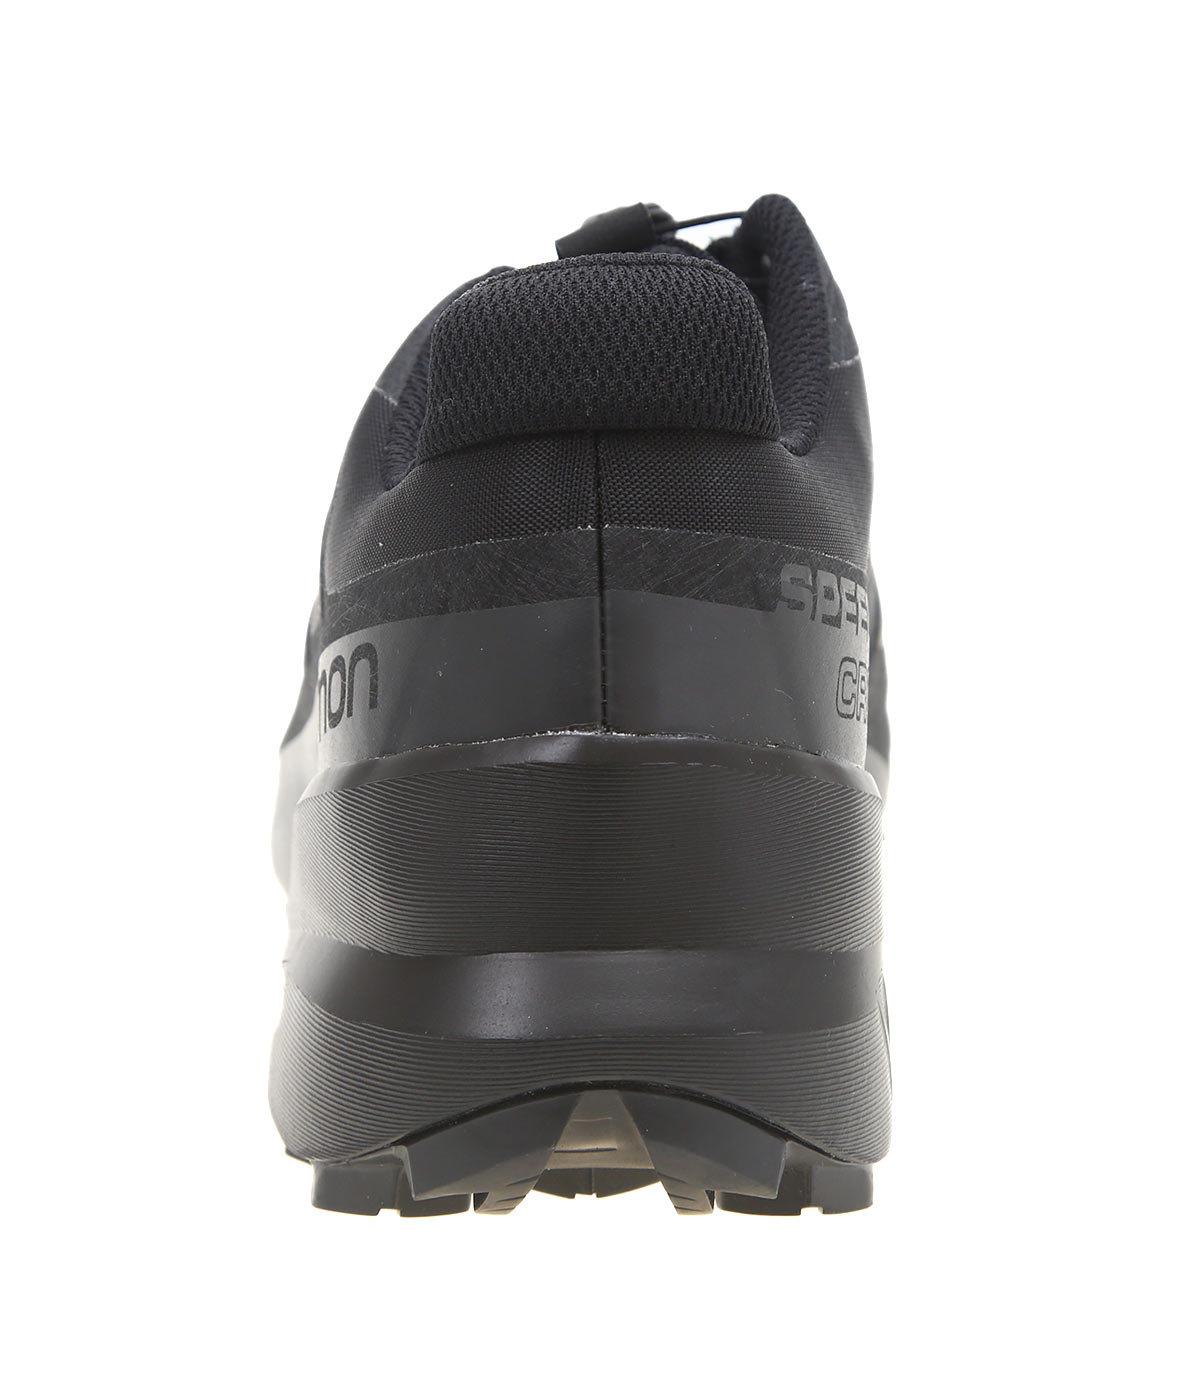 SPEEDCROSS 5 GORE-TEX   BLACK/BLACK/PHANTOM